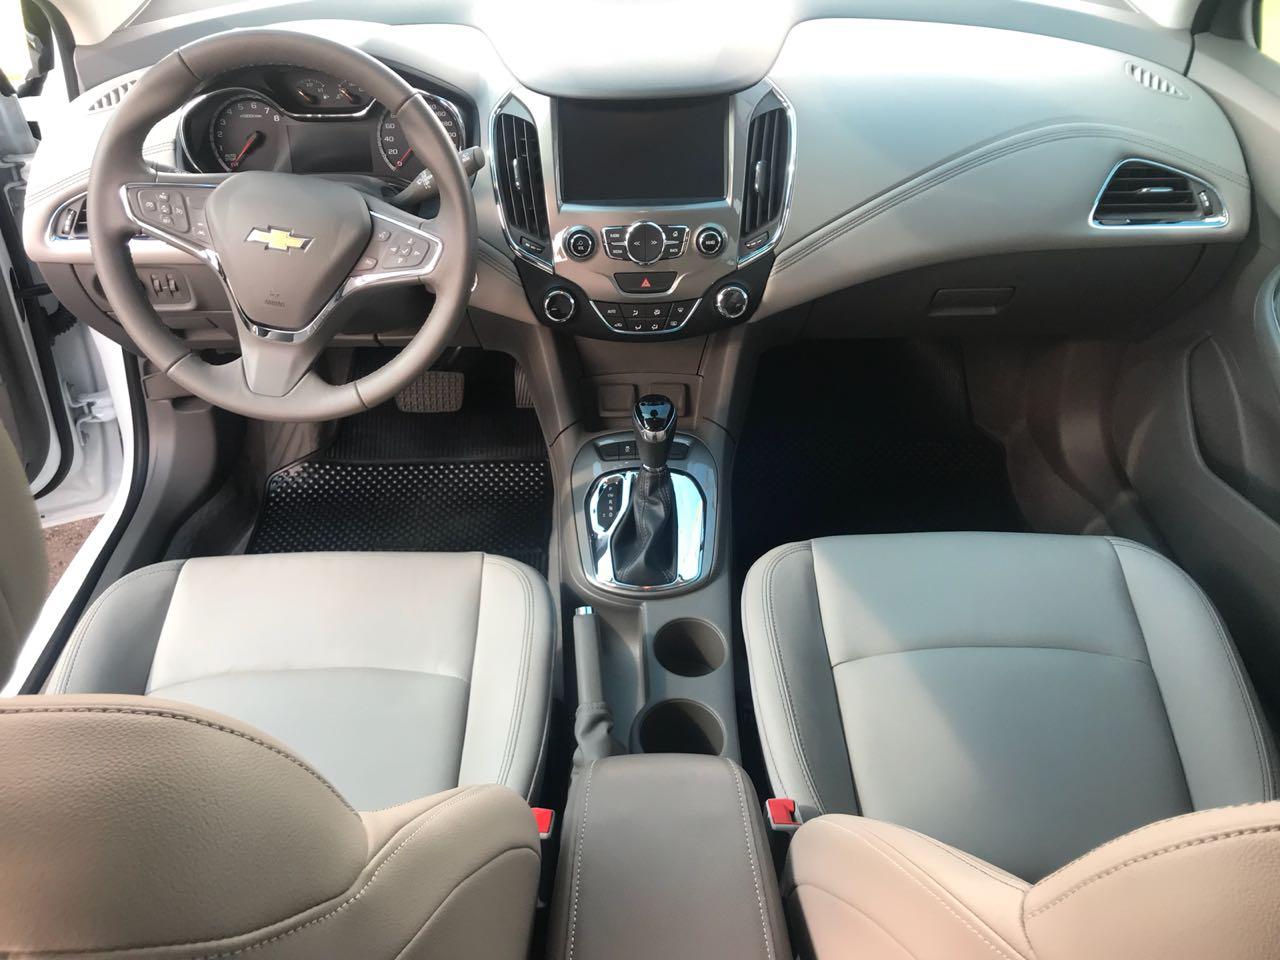 Chevrolet Cruze LTZ TURBO 1.4 2018